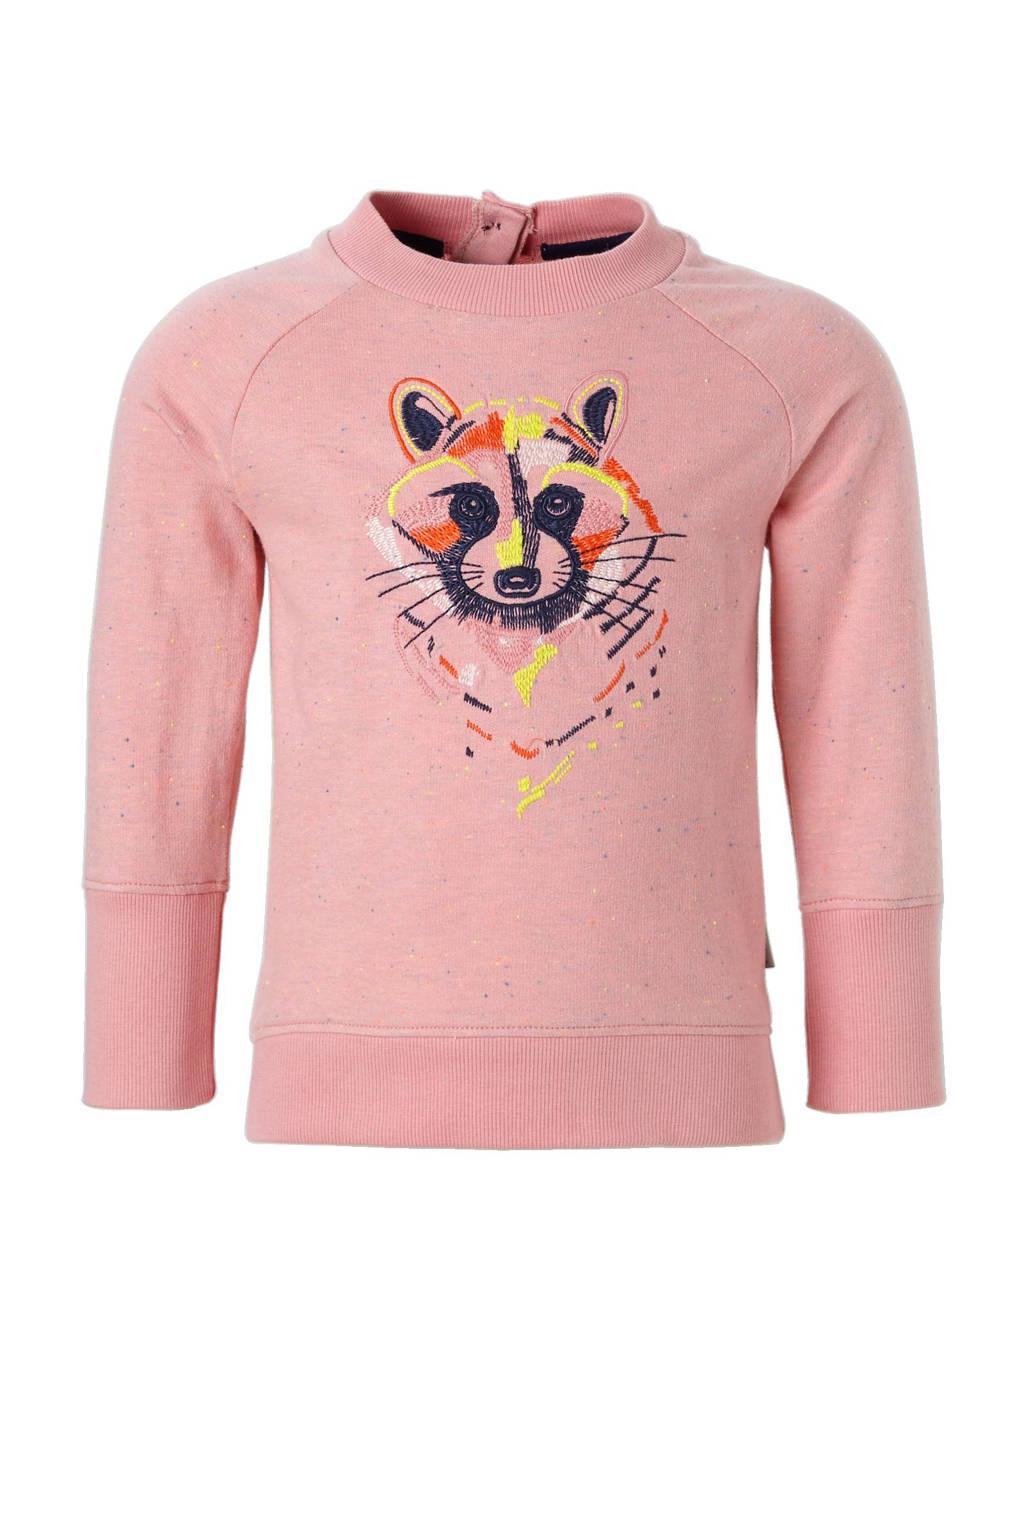 Noppies sweater Toney met borduursels roze, Roze/marine